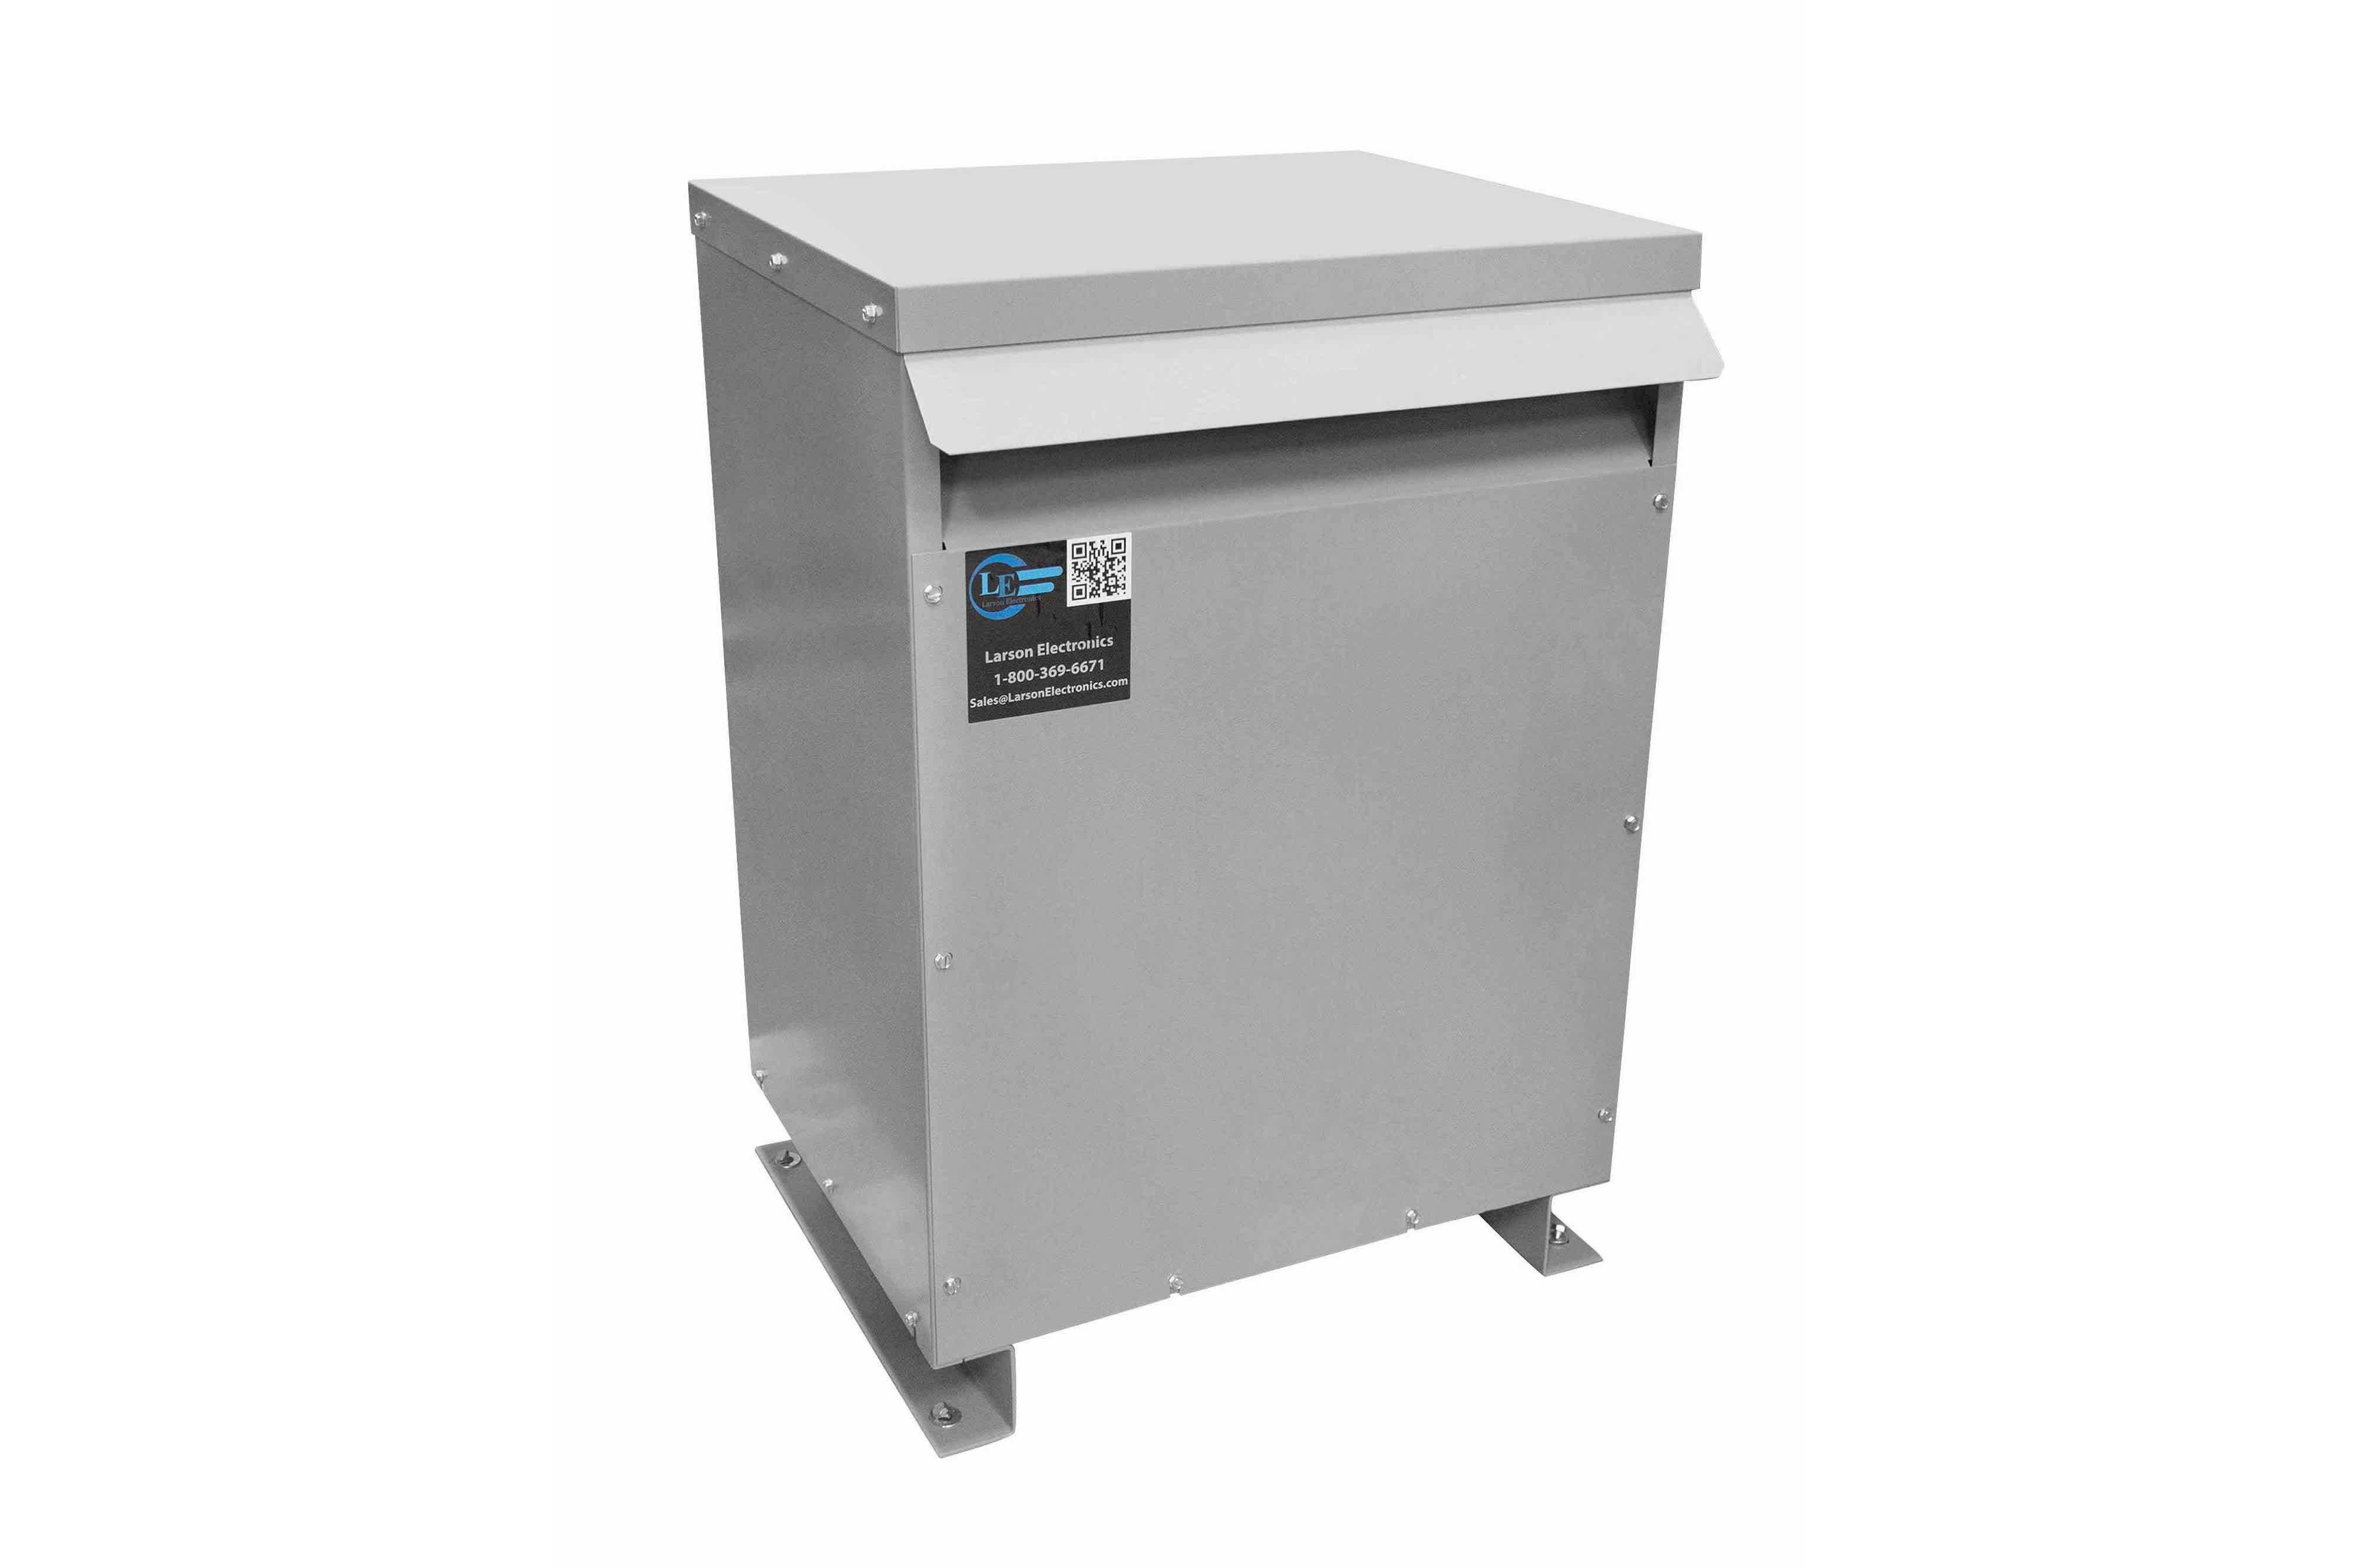 237.5 kVA 3PH Isolation Transformer, 240V Wye Primary, 480V Delta Secondary, N3R, Ventilated, 60 Hz